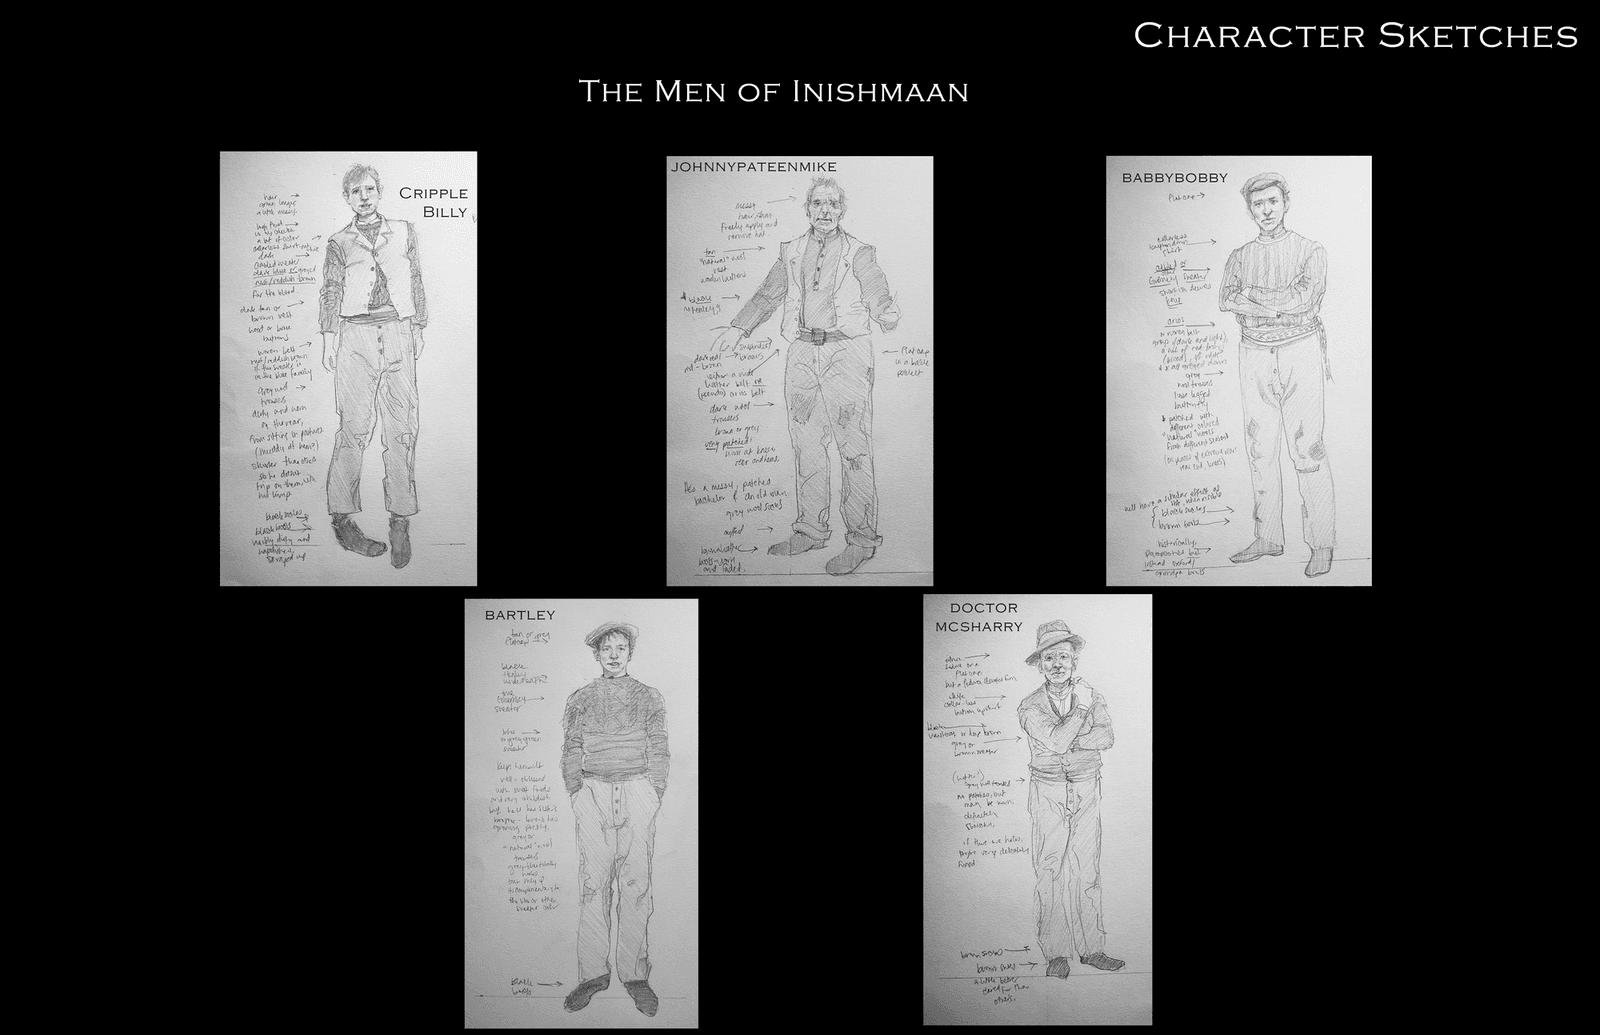 The Men of Inishmaan